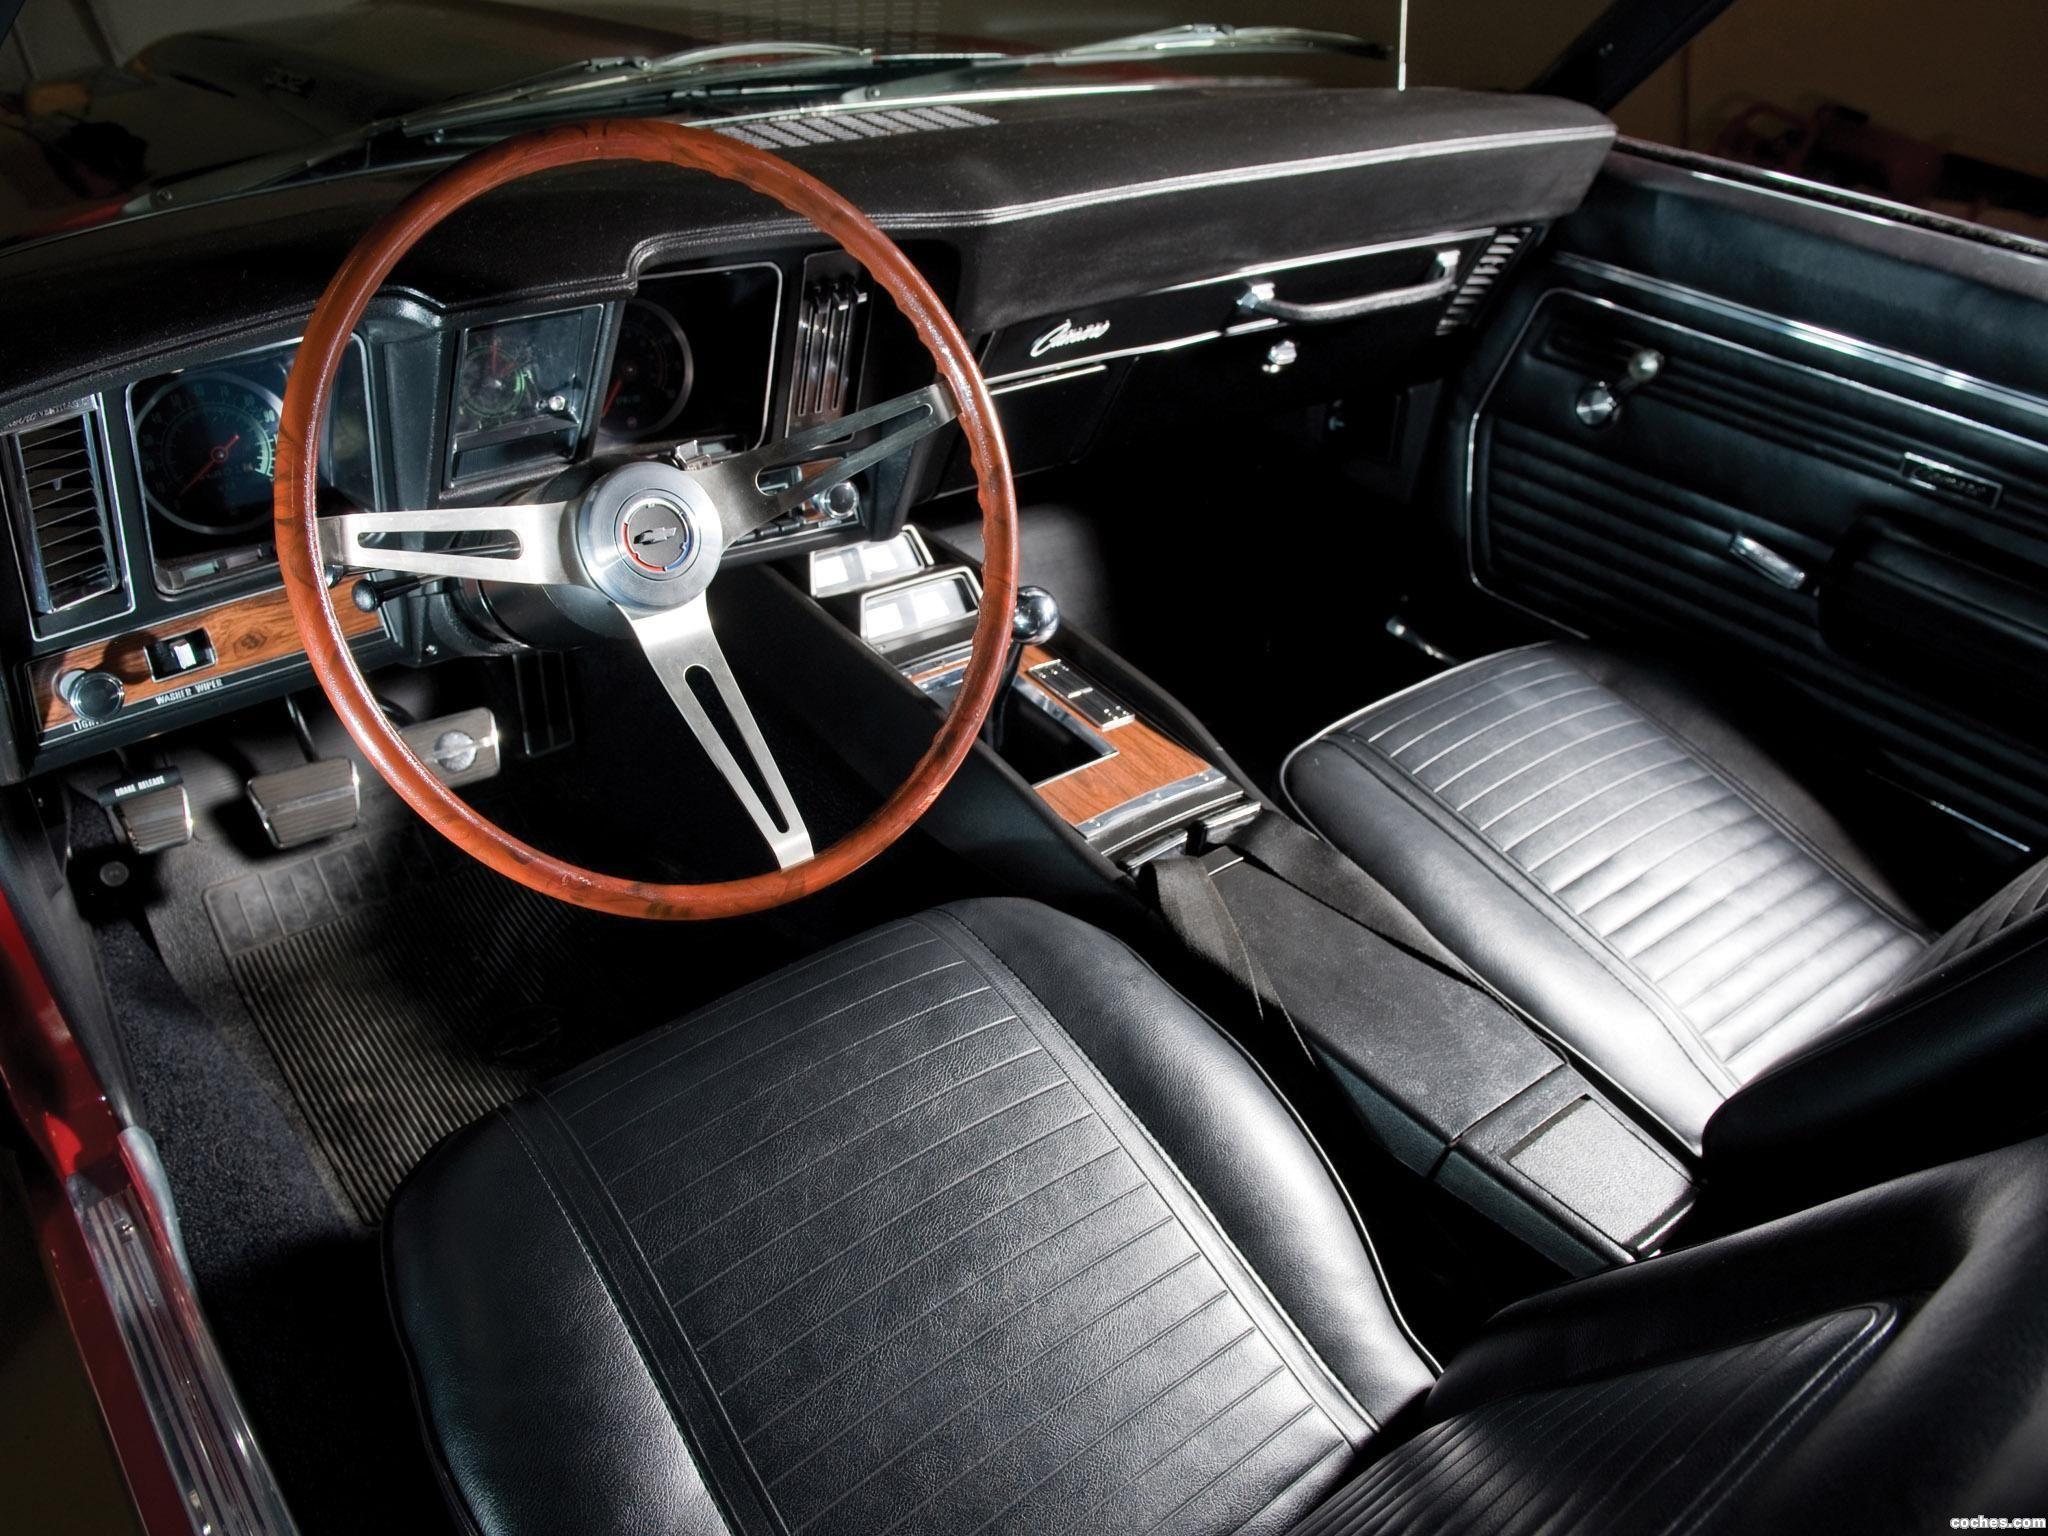 1969 Chevrolet Camaro Z 28 Interior Chevrolet Camaro Classic